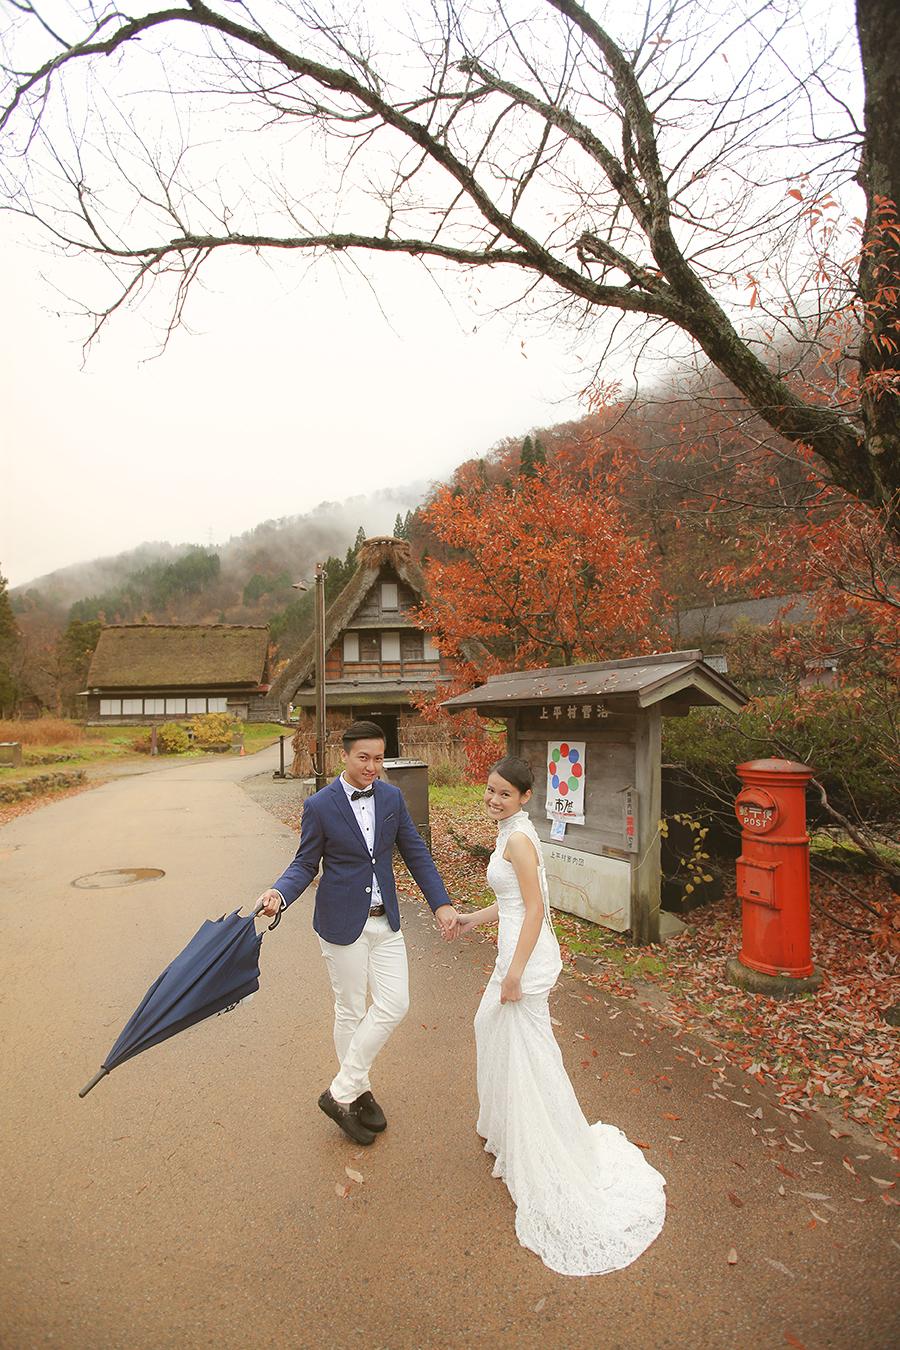 shirakawago japan . pre-wedding photography by kurt ahs . terry+zoey . 4259.jpg